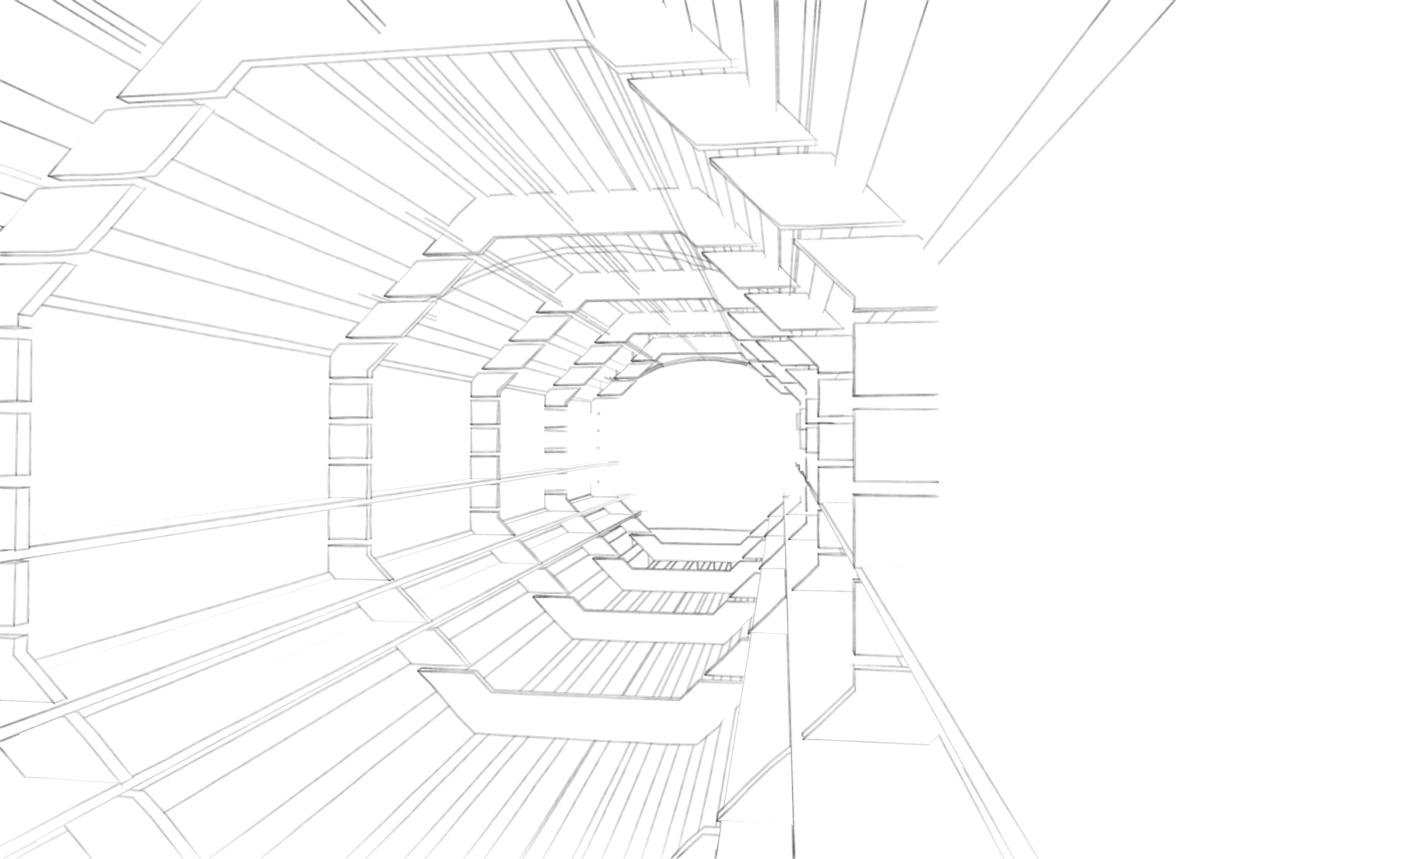 ULTA_2 Hair Tunnel_Mockup-1 Pencil2.jpg